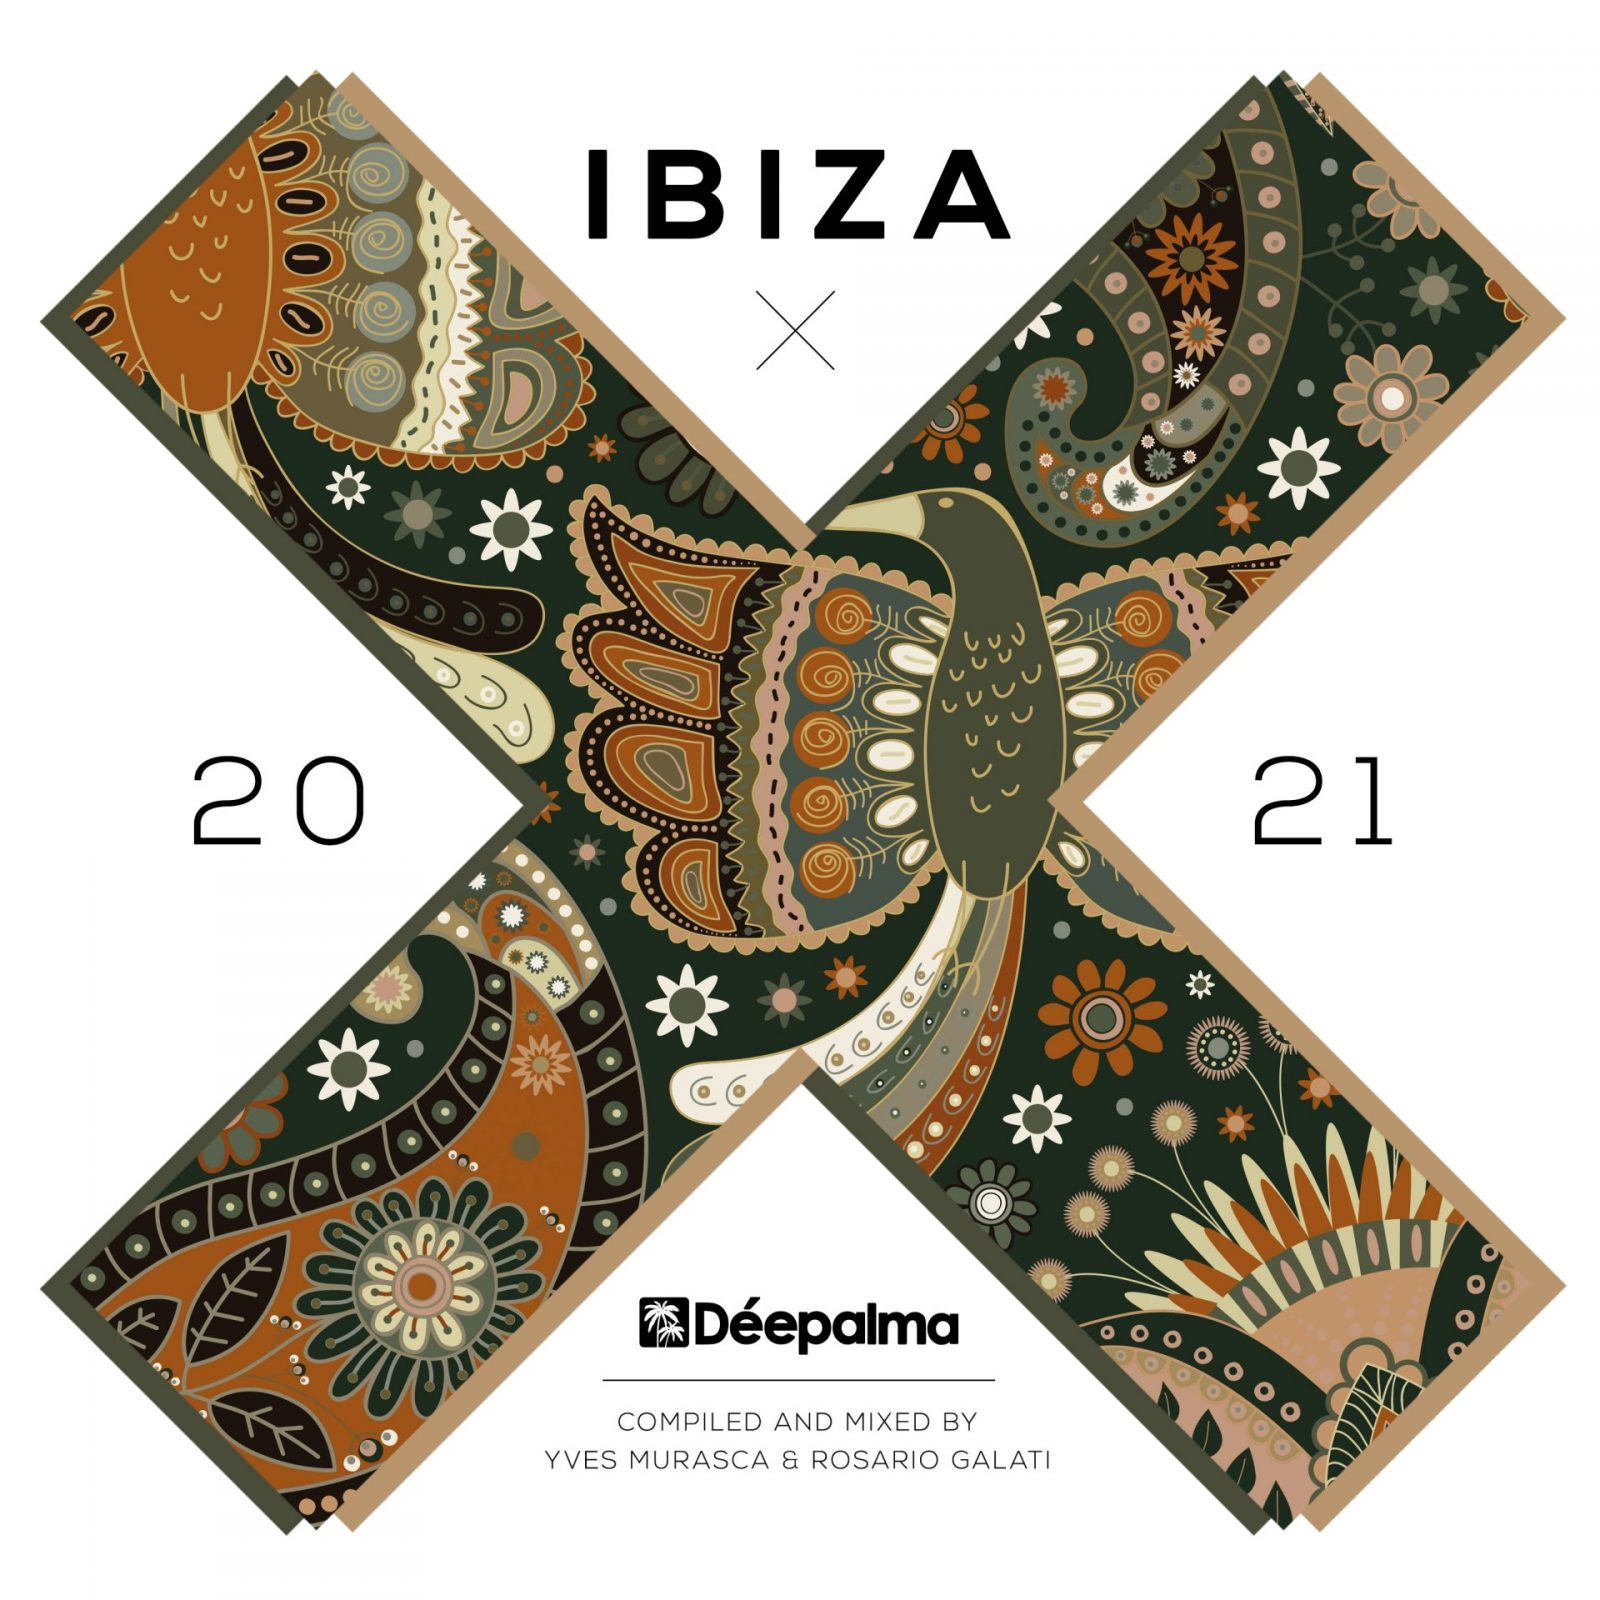 Déepalma Ibiza 2021 Mixed by Yves Murasca and Rosario Galati